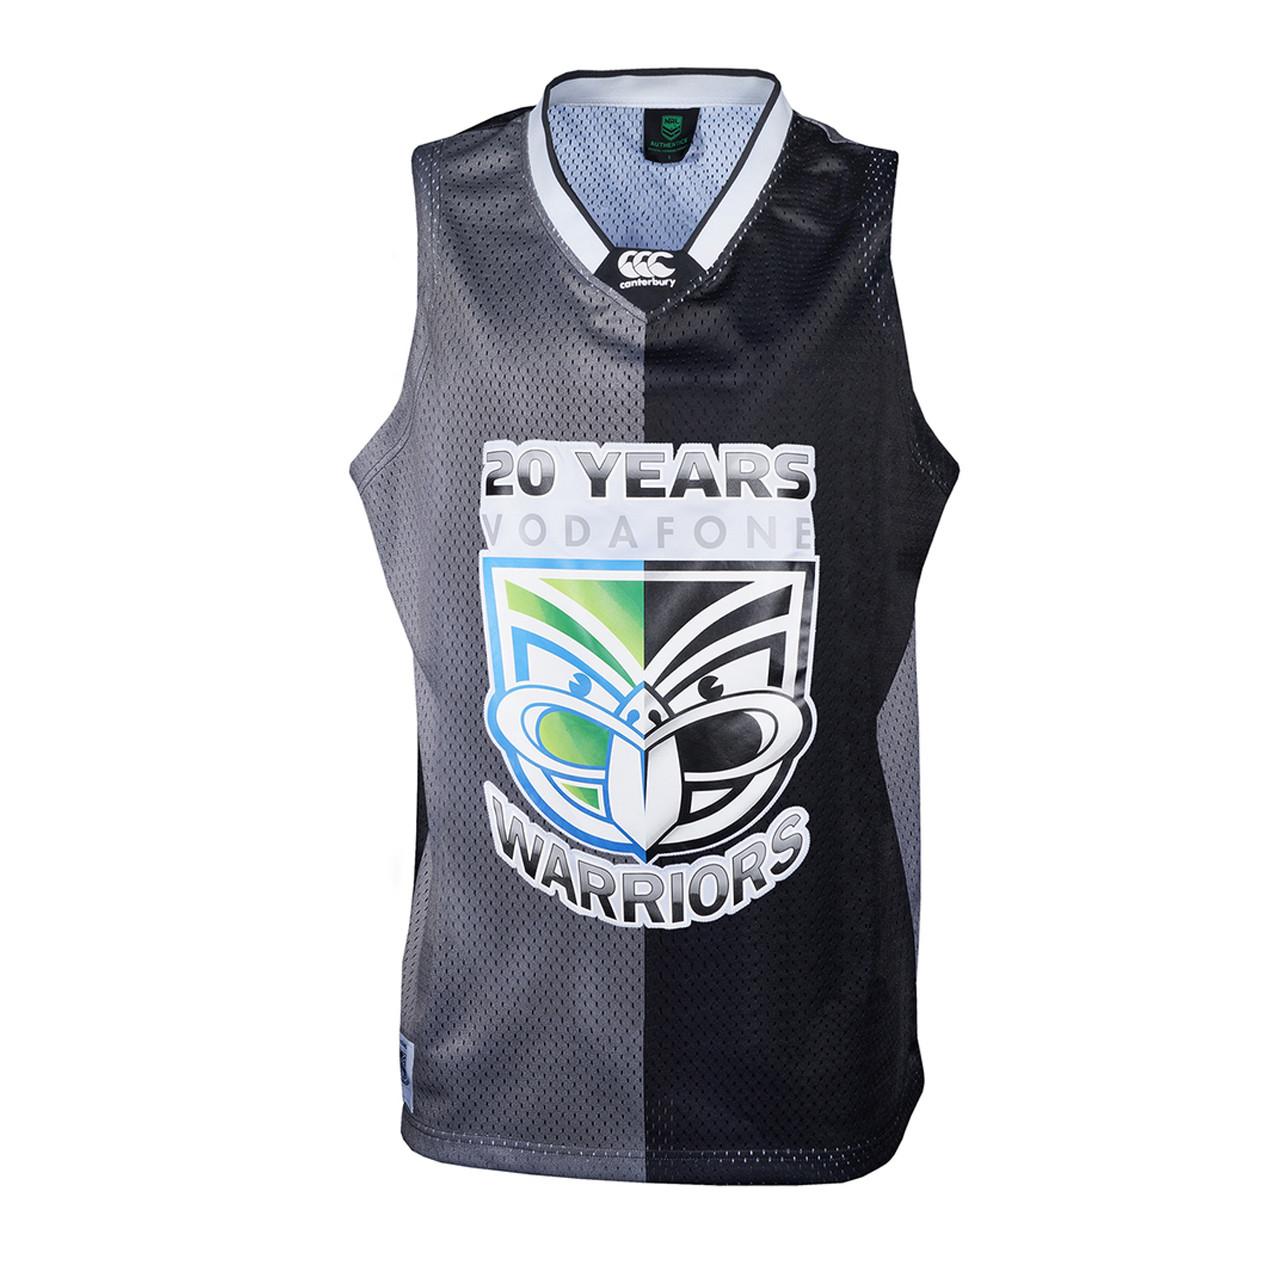 on sale 58b20 9d661 2015 Vodafone Warriors Basketball Singlet - Adults